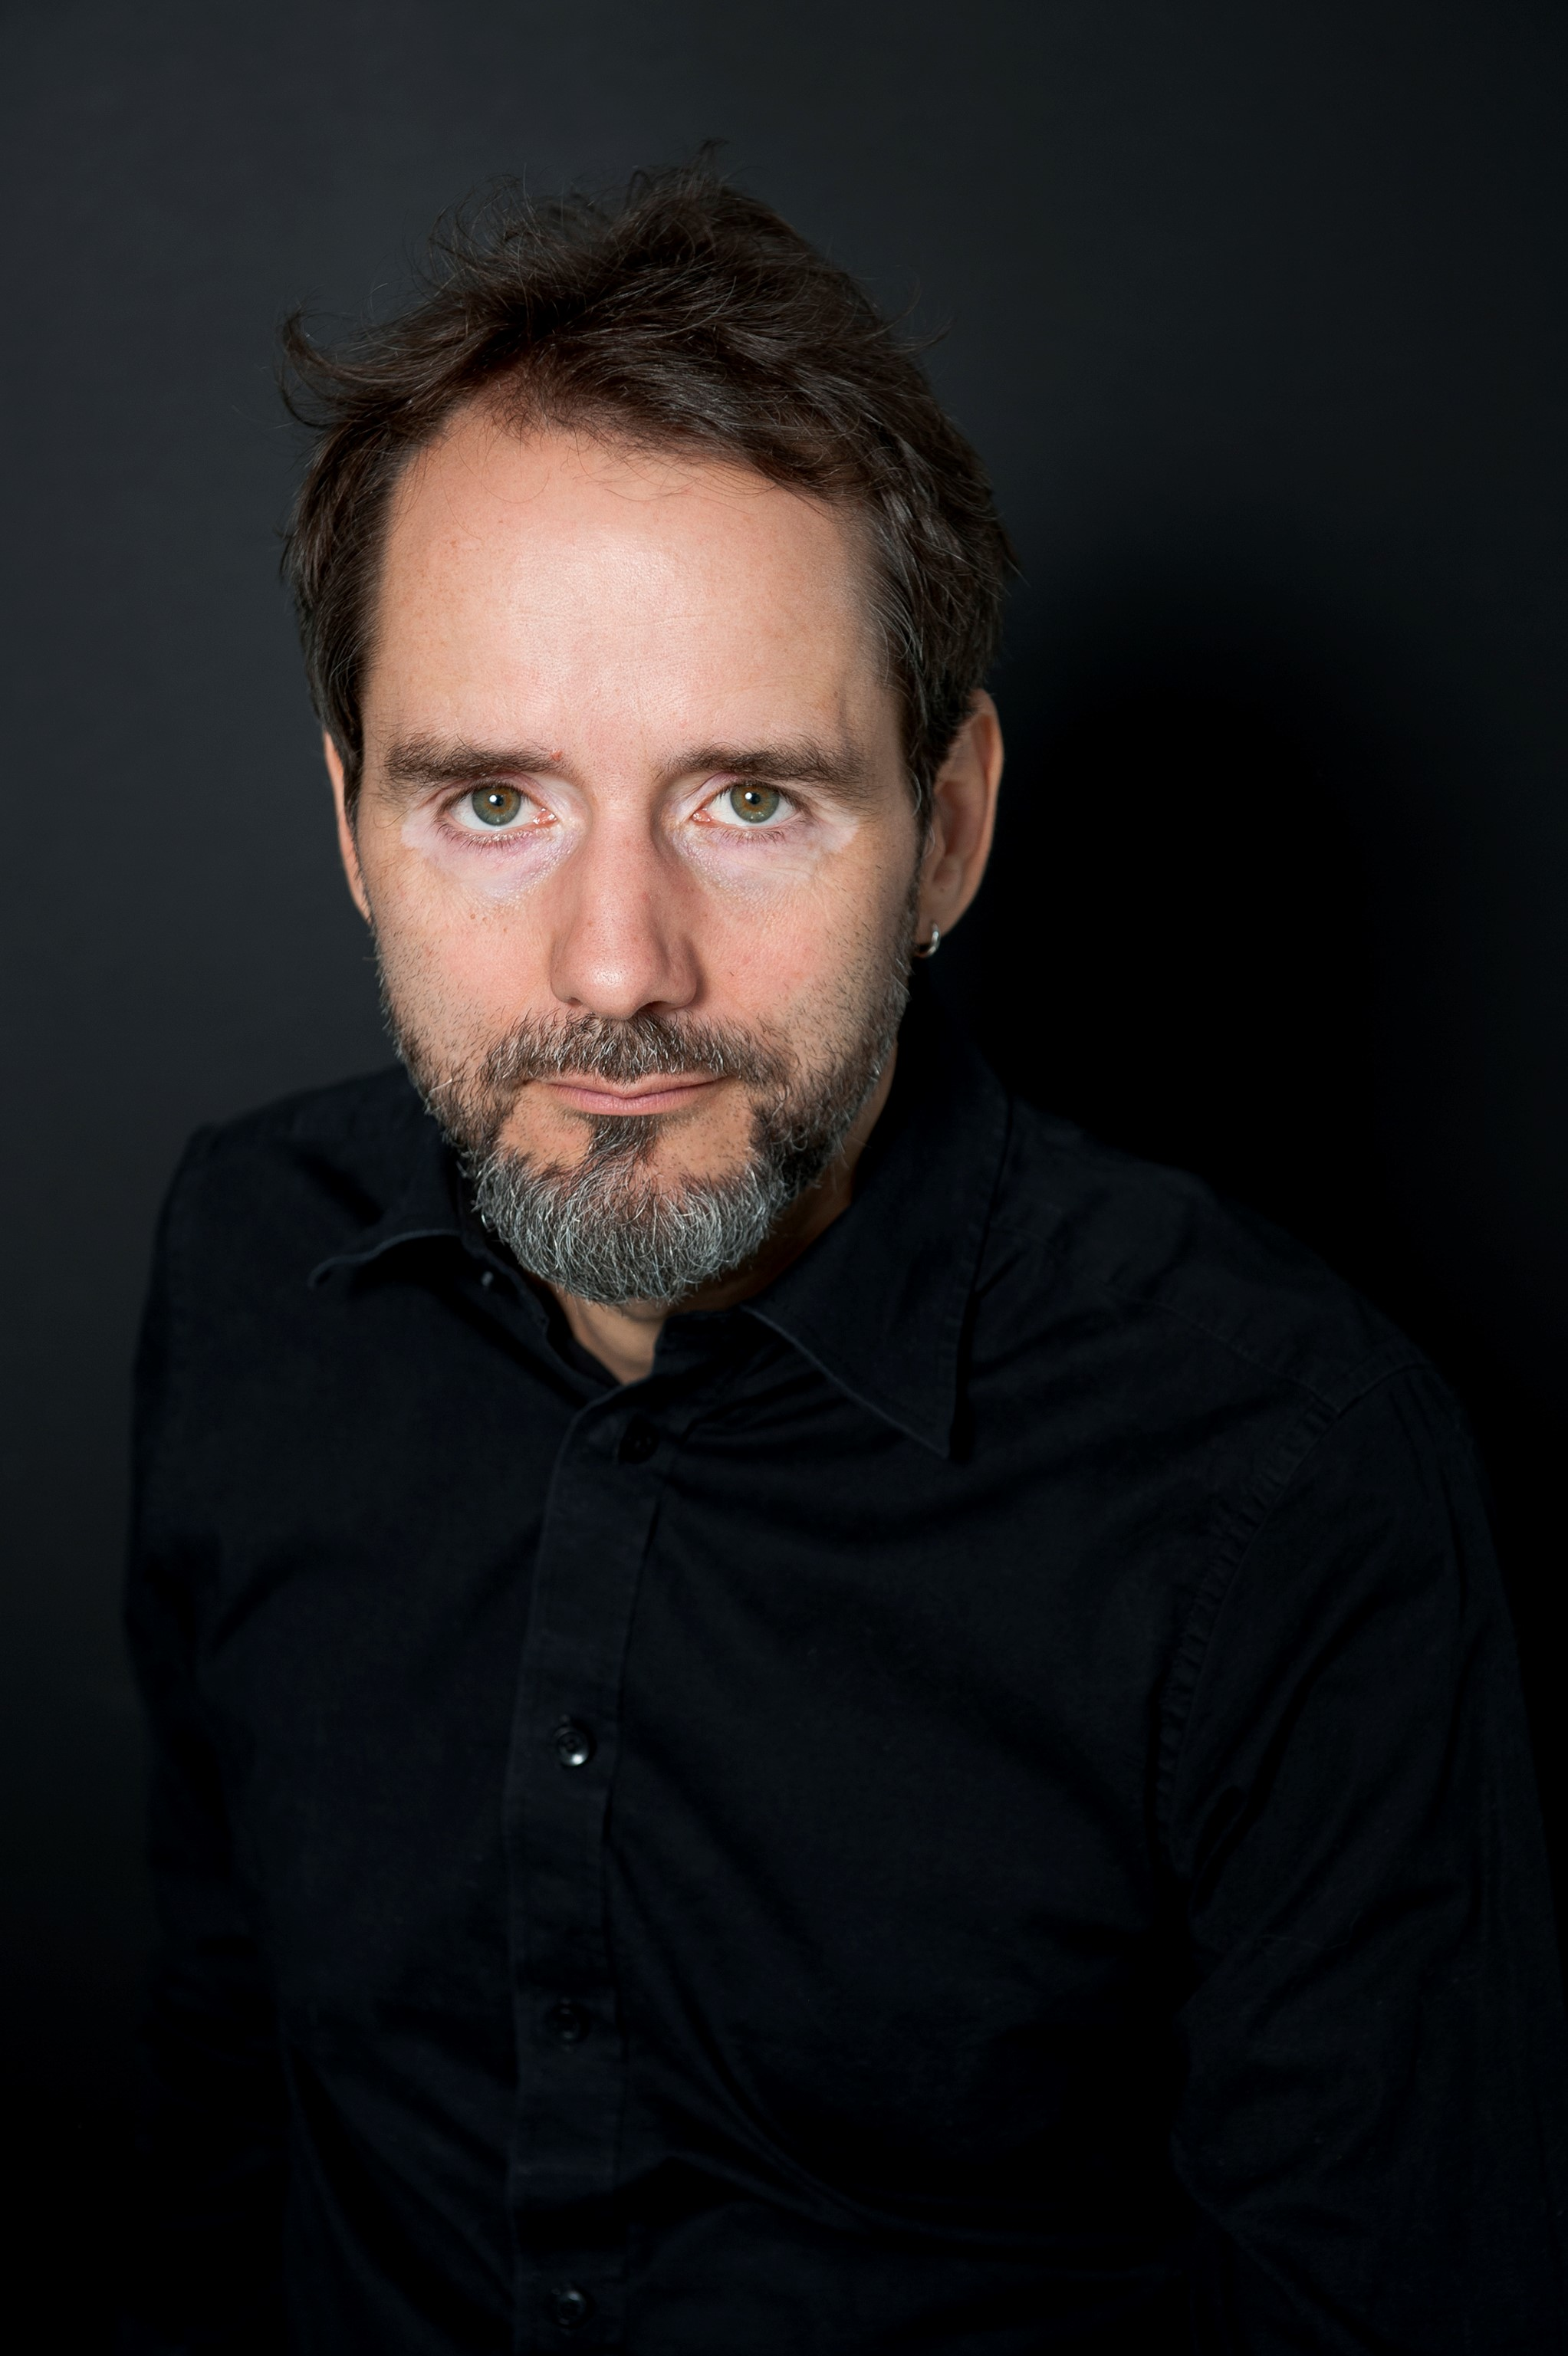 Miguel Passarge (Foto: Anika Potzler)